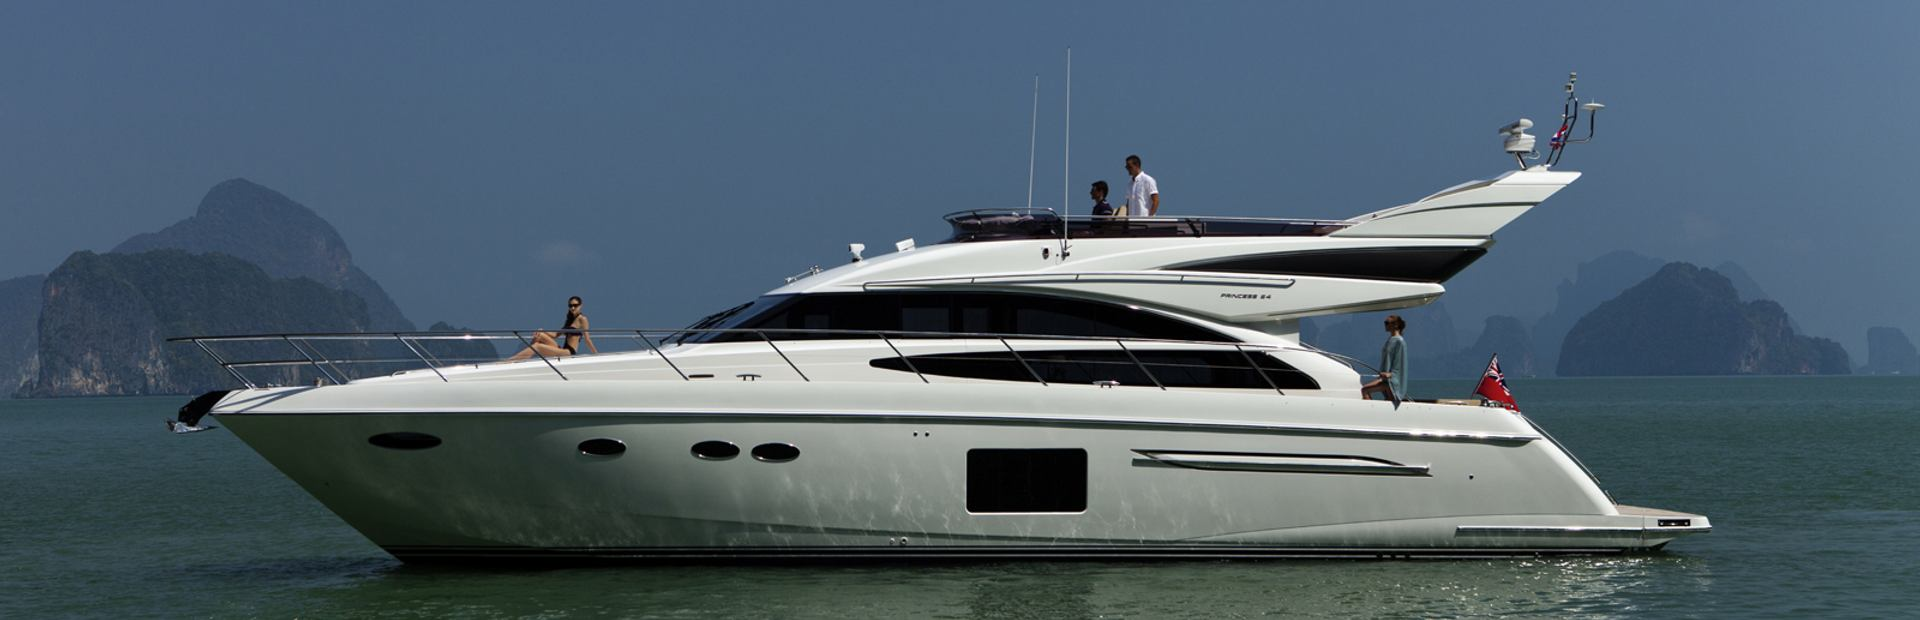 Princess 64 Yacht Charter